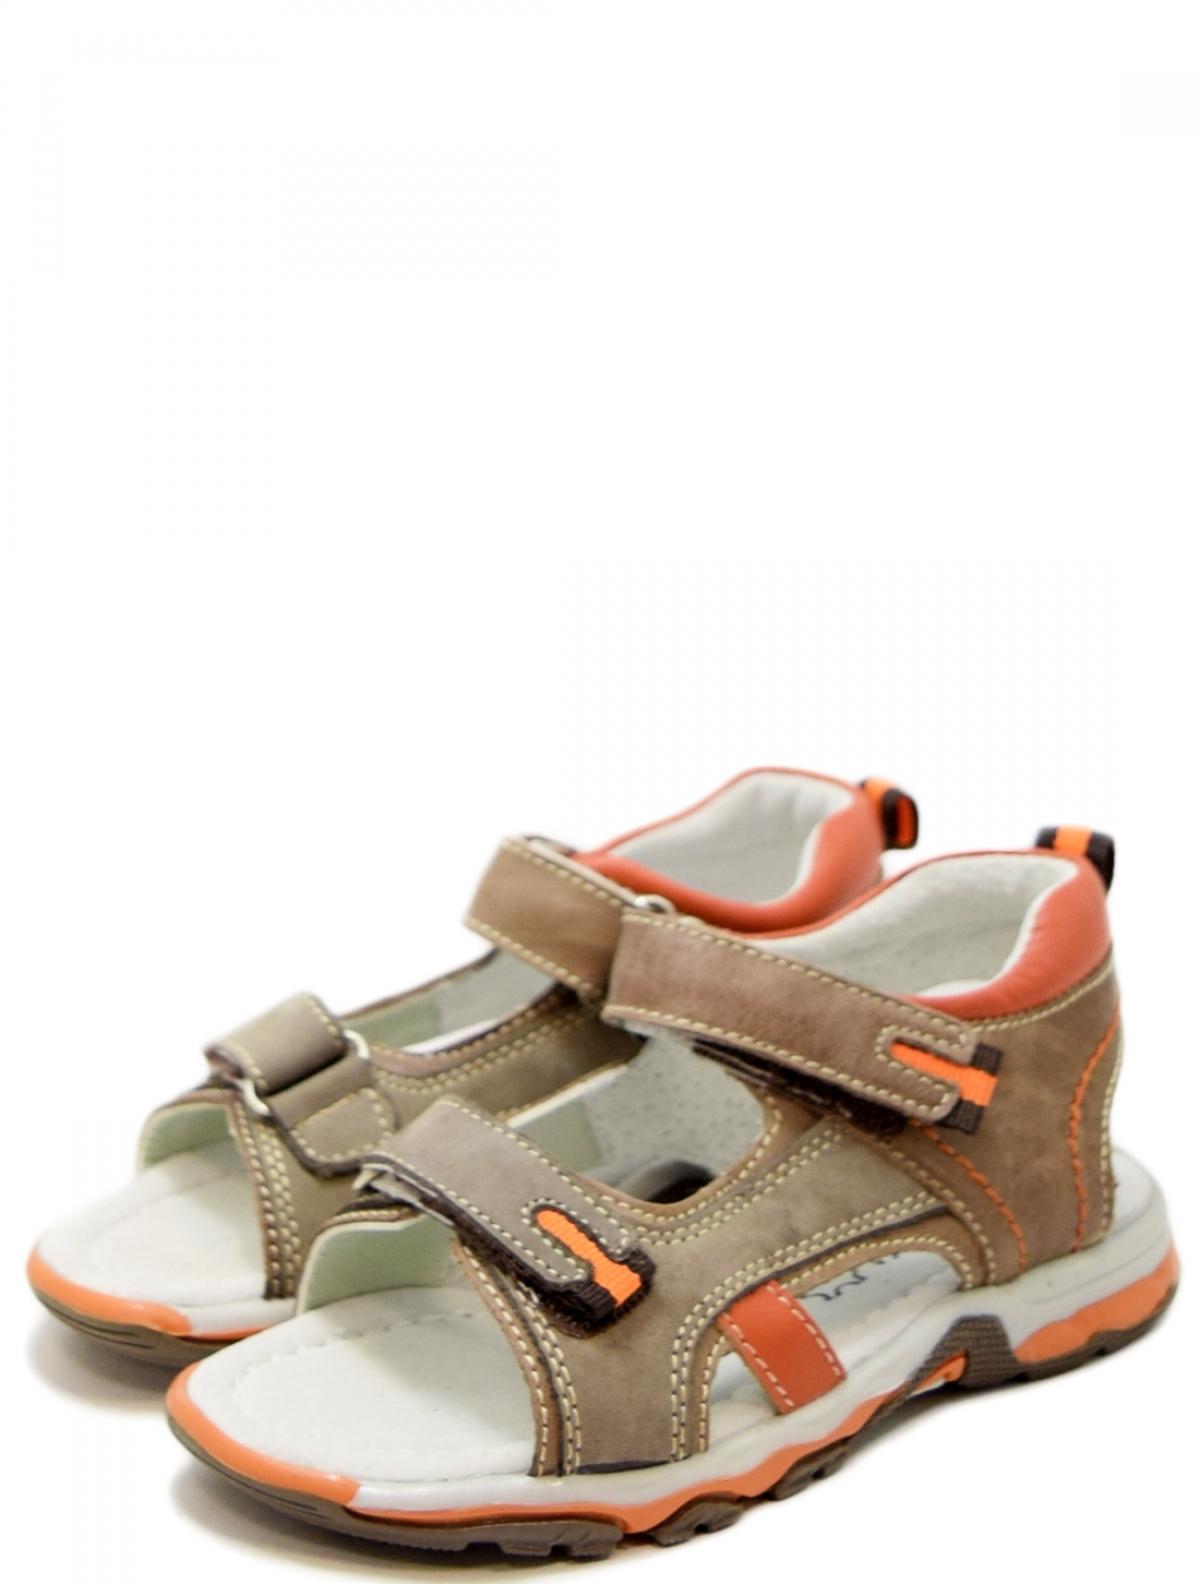 Капитошка A9690 сандали для мальчика